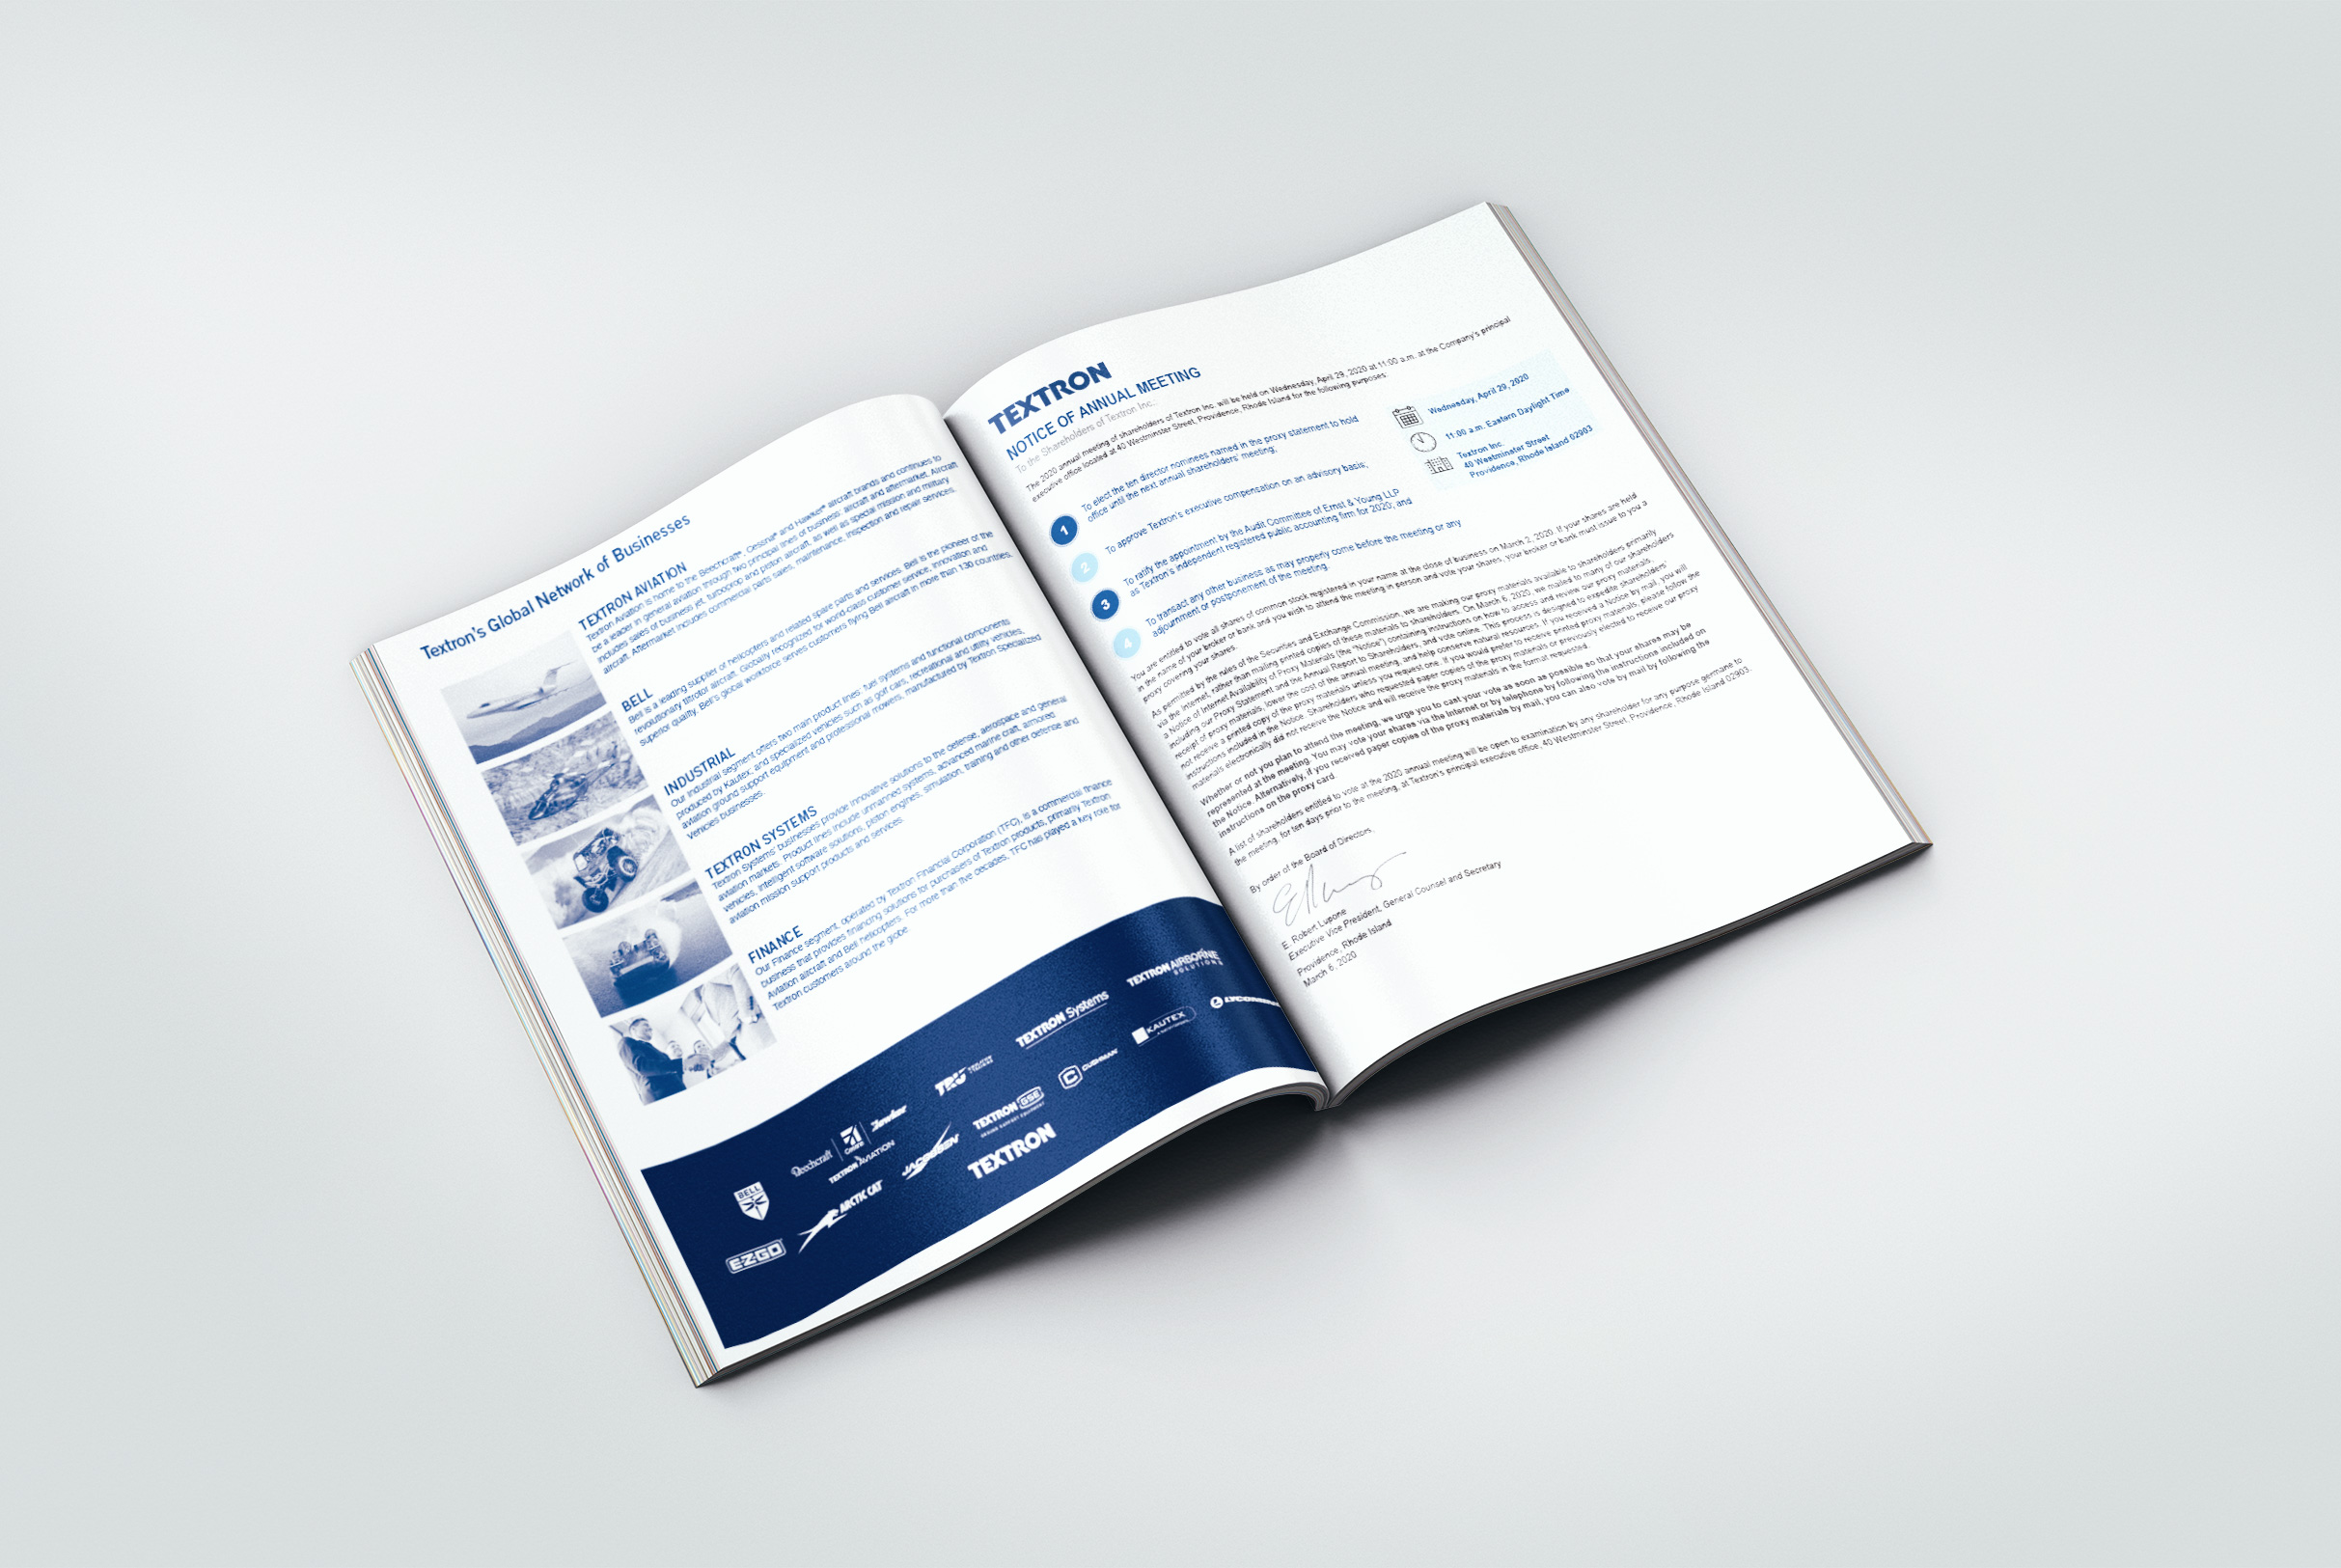 textron-Magazine